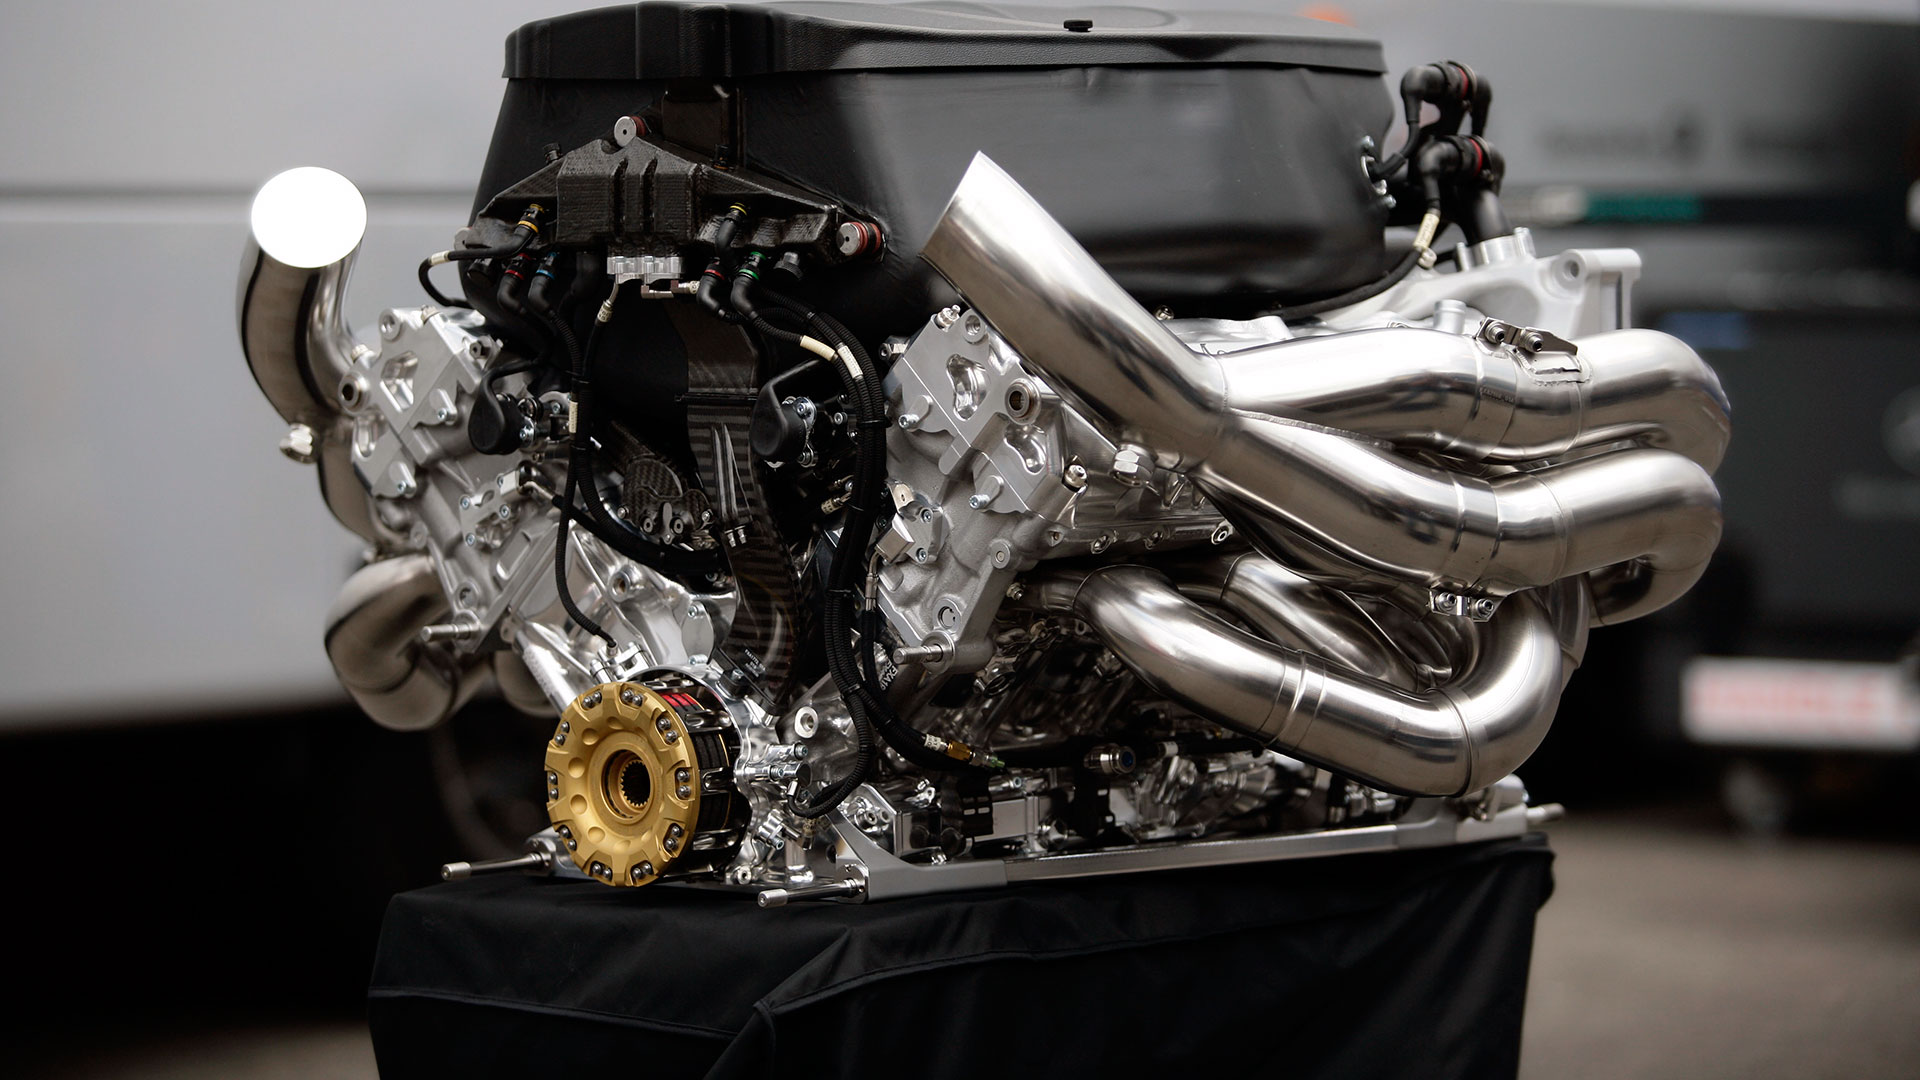 f1 engine wallpaper - photo #11